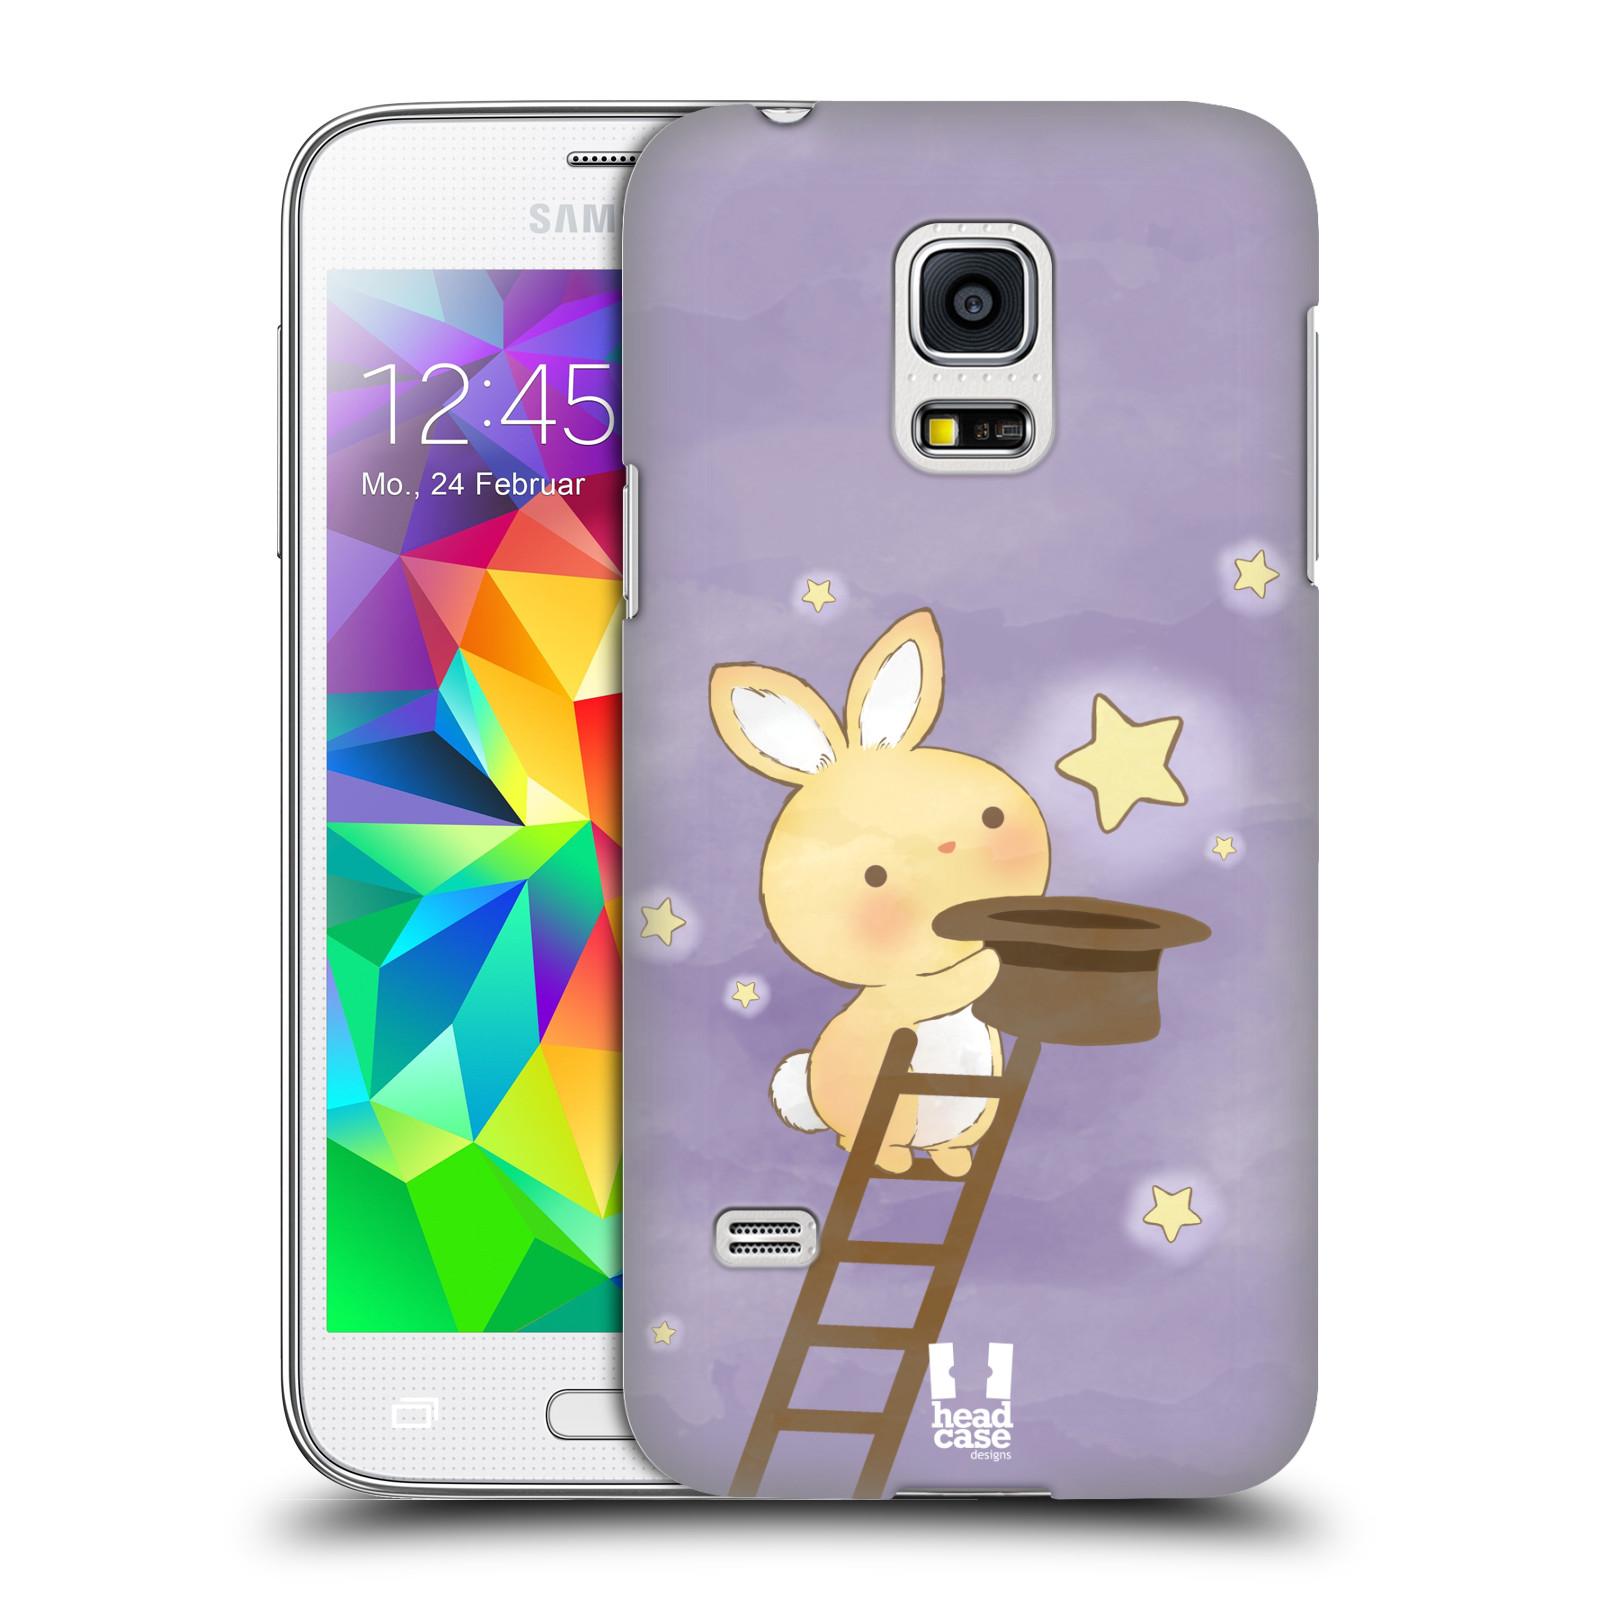 HEAD CASE plastový obal na mobil SAMSUNG Galaxy S5 MINI / S5 MINI DUOS vzor králíček a hvězdy fialová